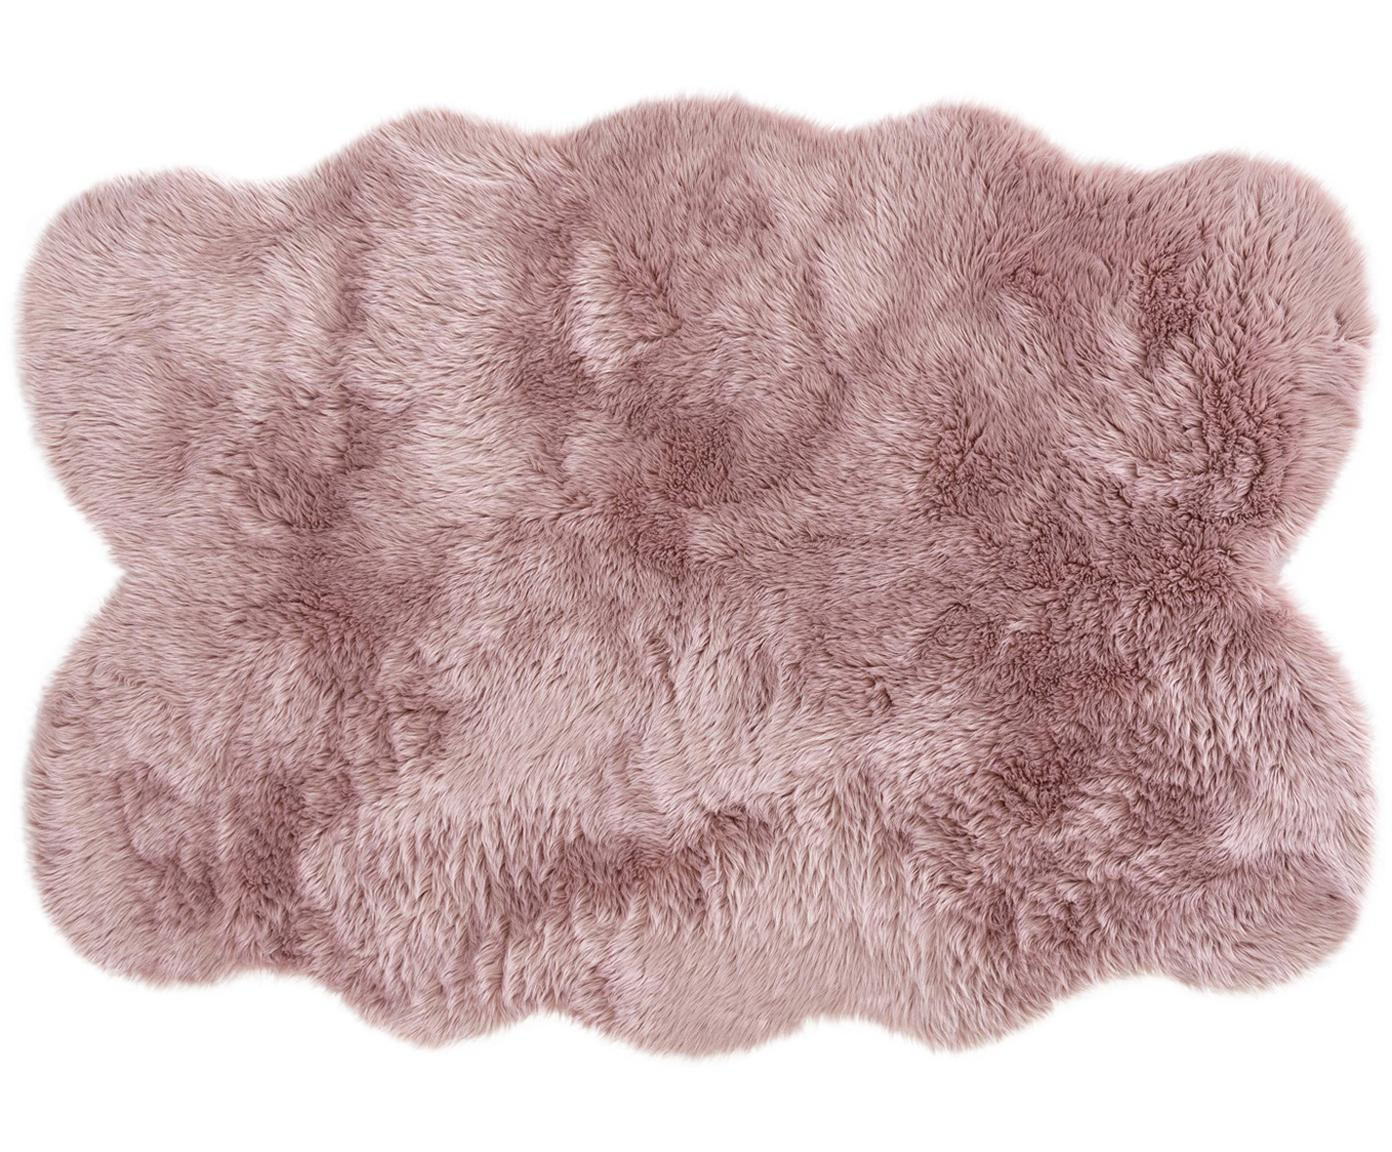 Imitatie schapenvacht Elmo, glad, Bovenzijde: 50% acryl, 50% polyester, Onderzijde: polyester, Roze, B 140 x L 200 cm (maat S)